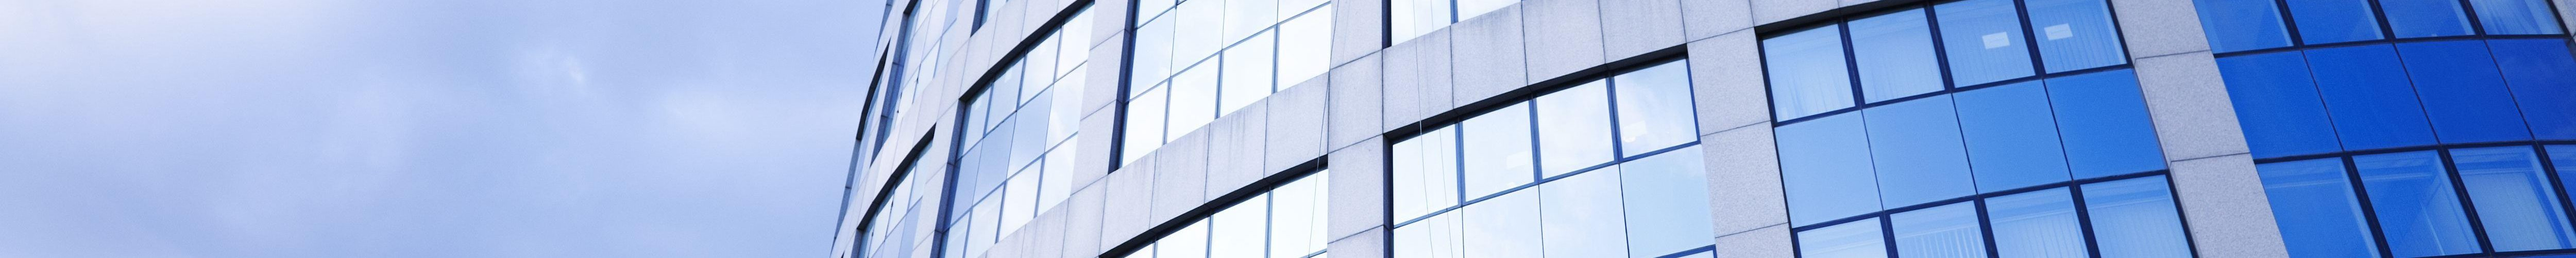 5670125 - modern building